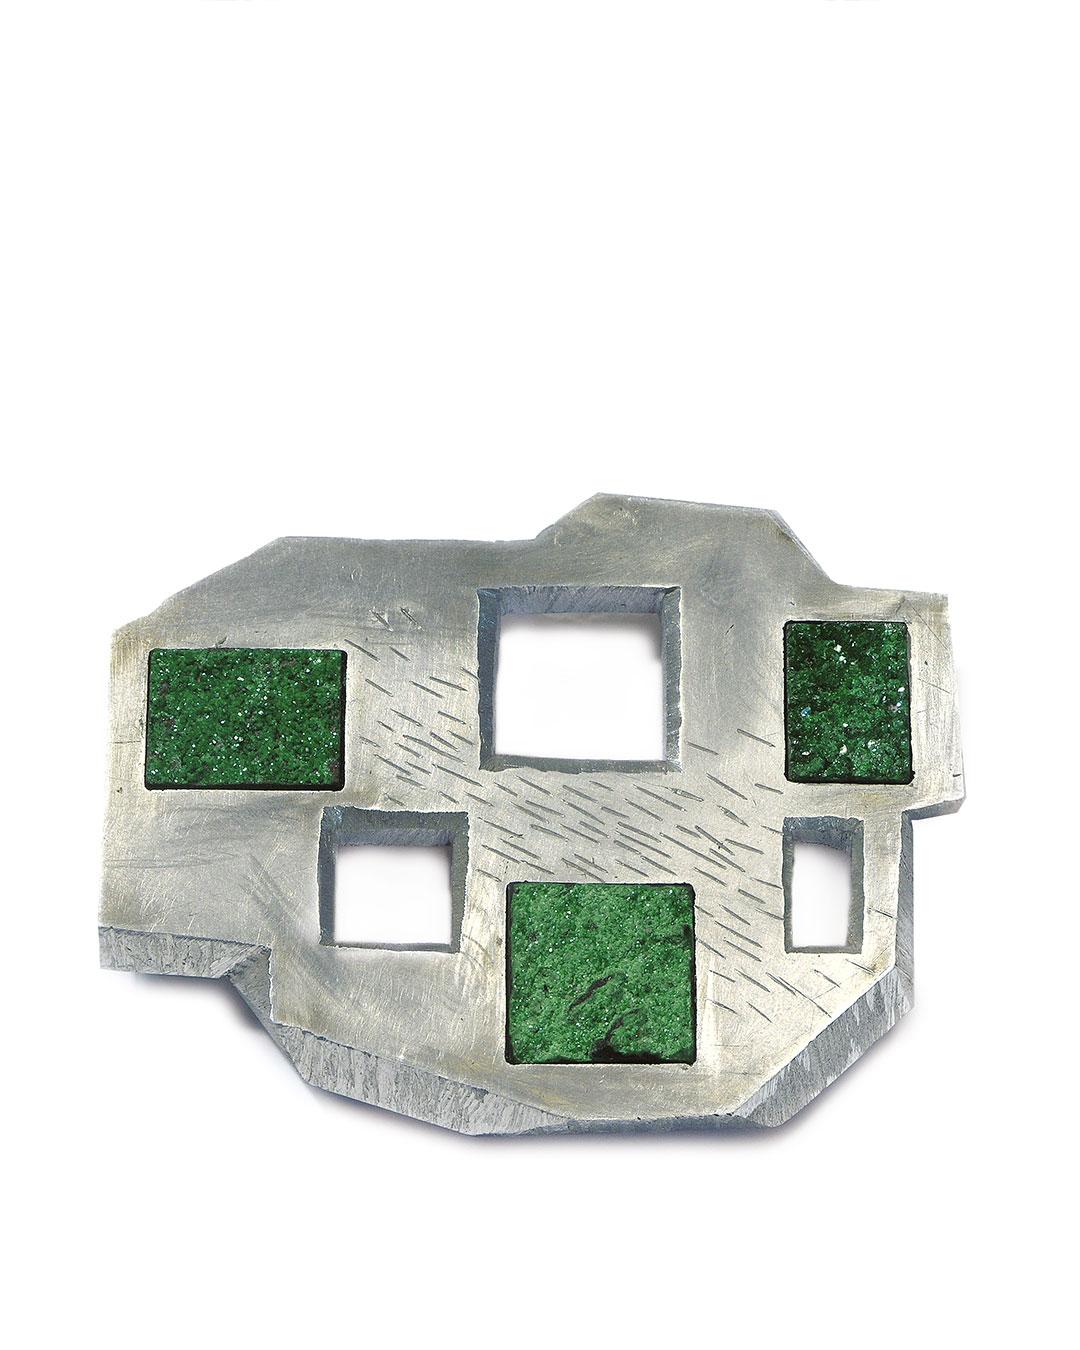 Sybille Richter, Felder II (Fields II), 2009, brooch; uvarovite, aluminium, silver, 60 x 50 x 10 mm, €780